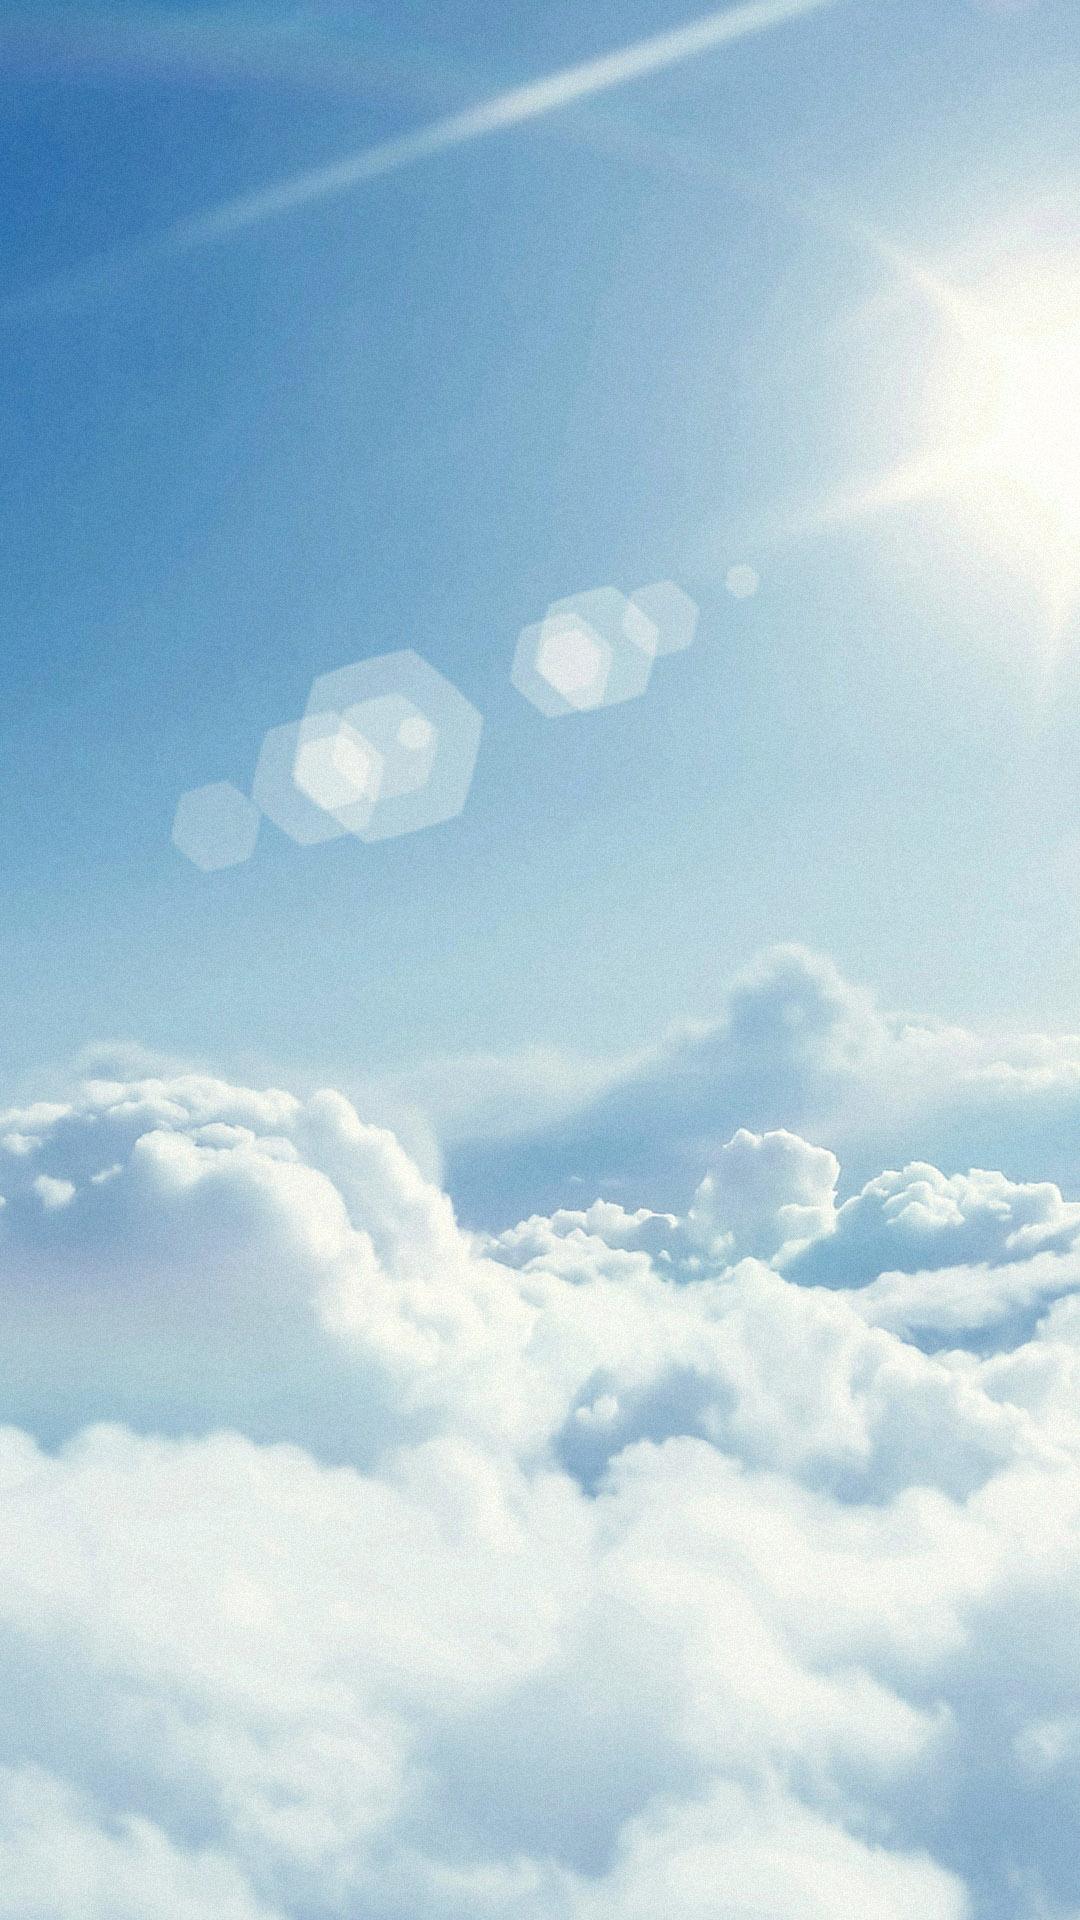 fantasy sky background h5  romantic  beautiful  dream